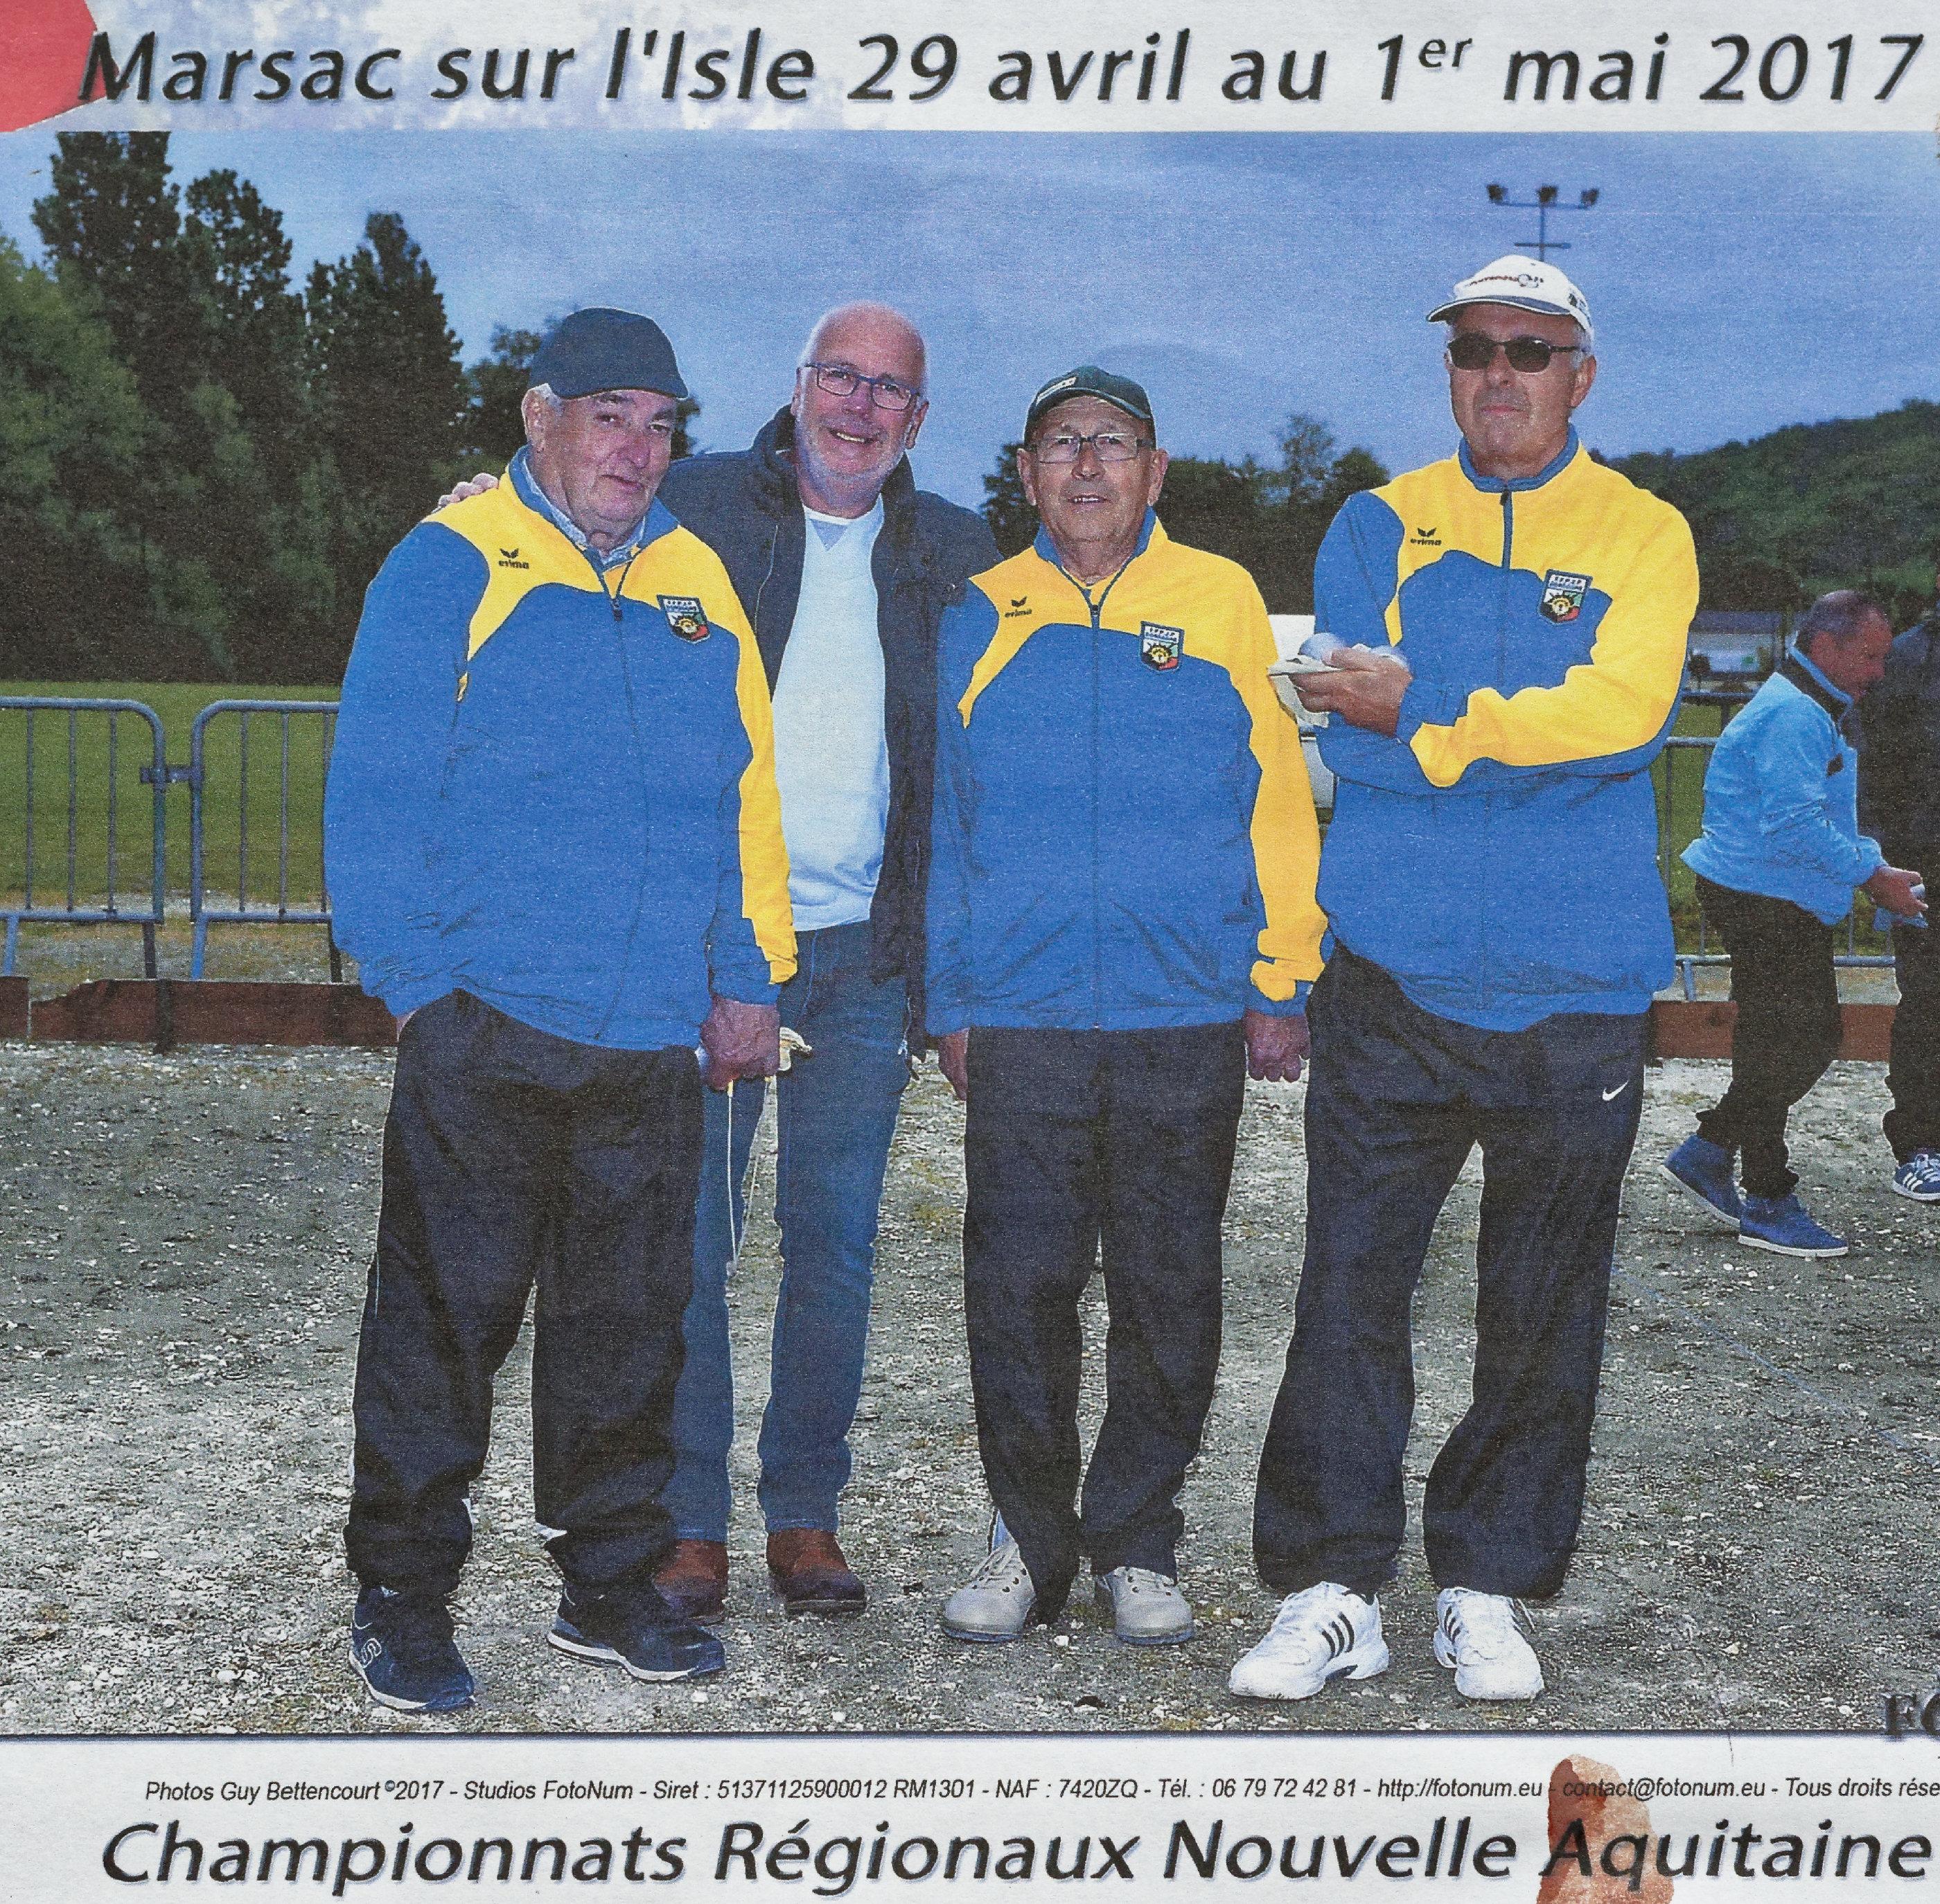 2017-04 - Marsac sur l'Isle Baroni-Cabar-Lloris